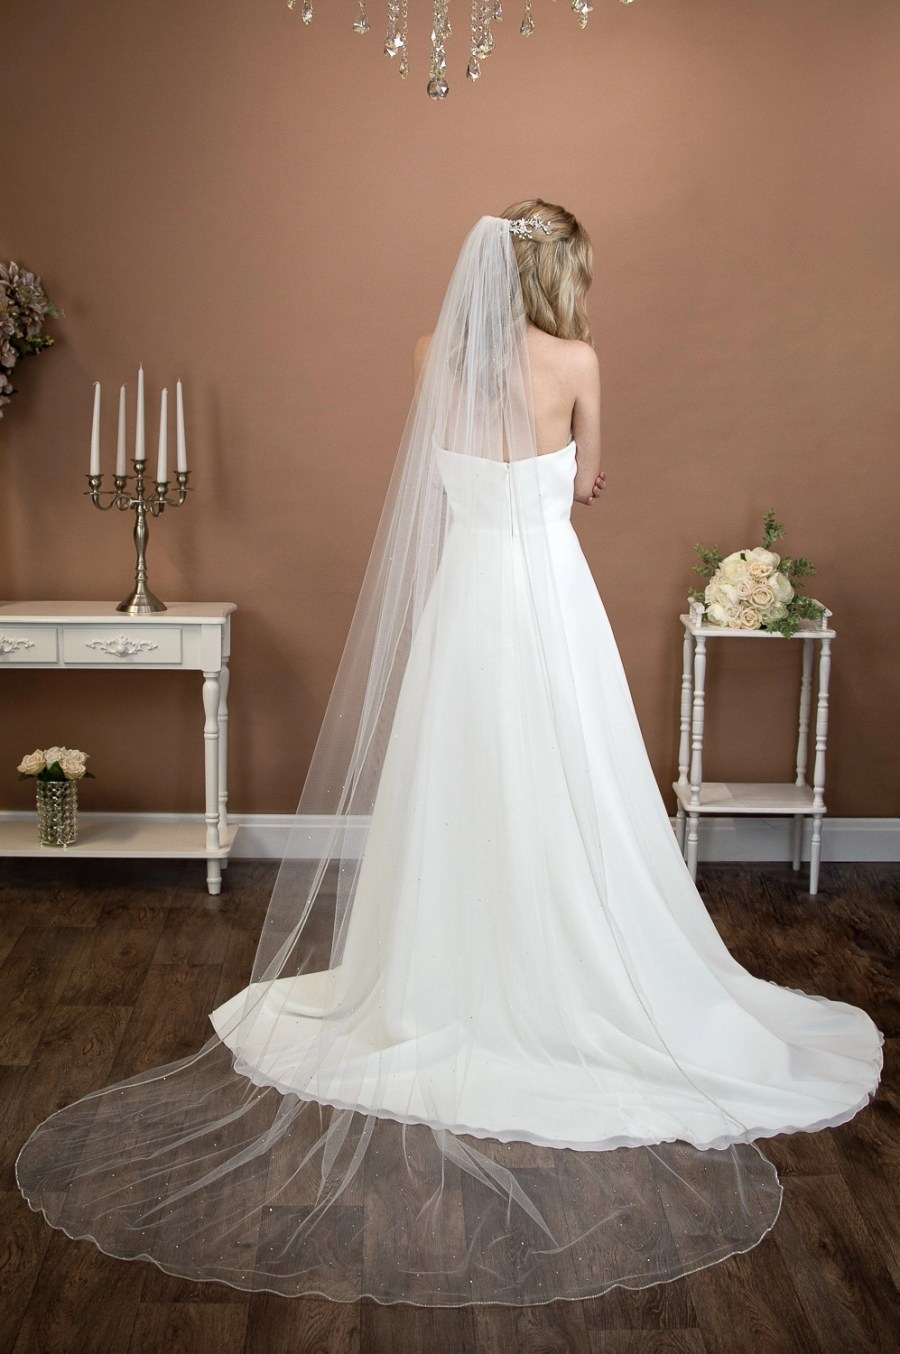 Alexandra - one layer long chapel veil with rhinestone edge and diamantes falling stars on bride